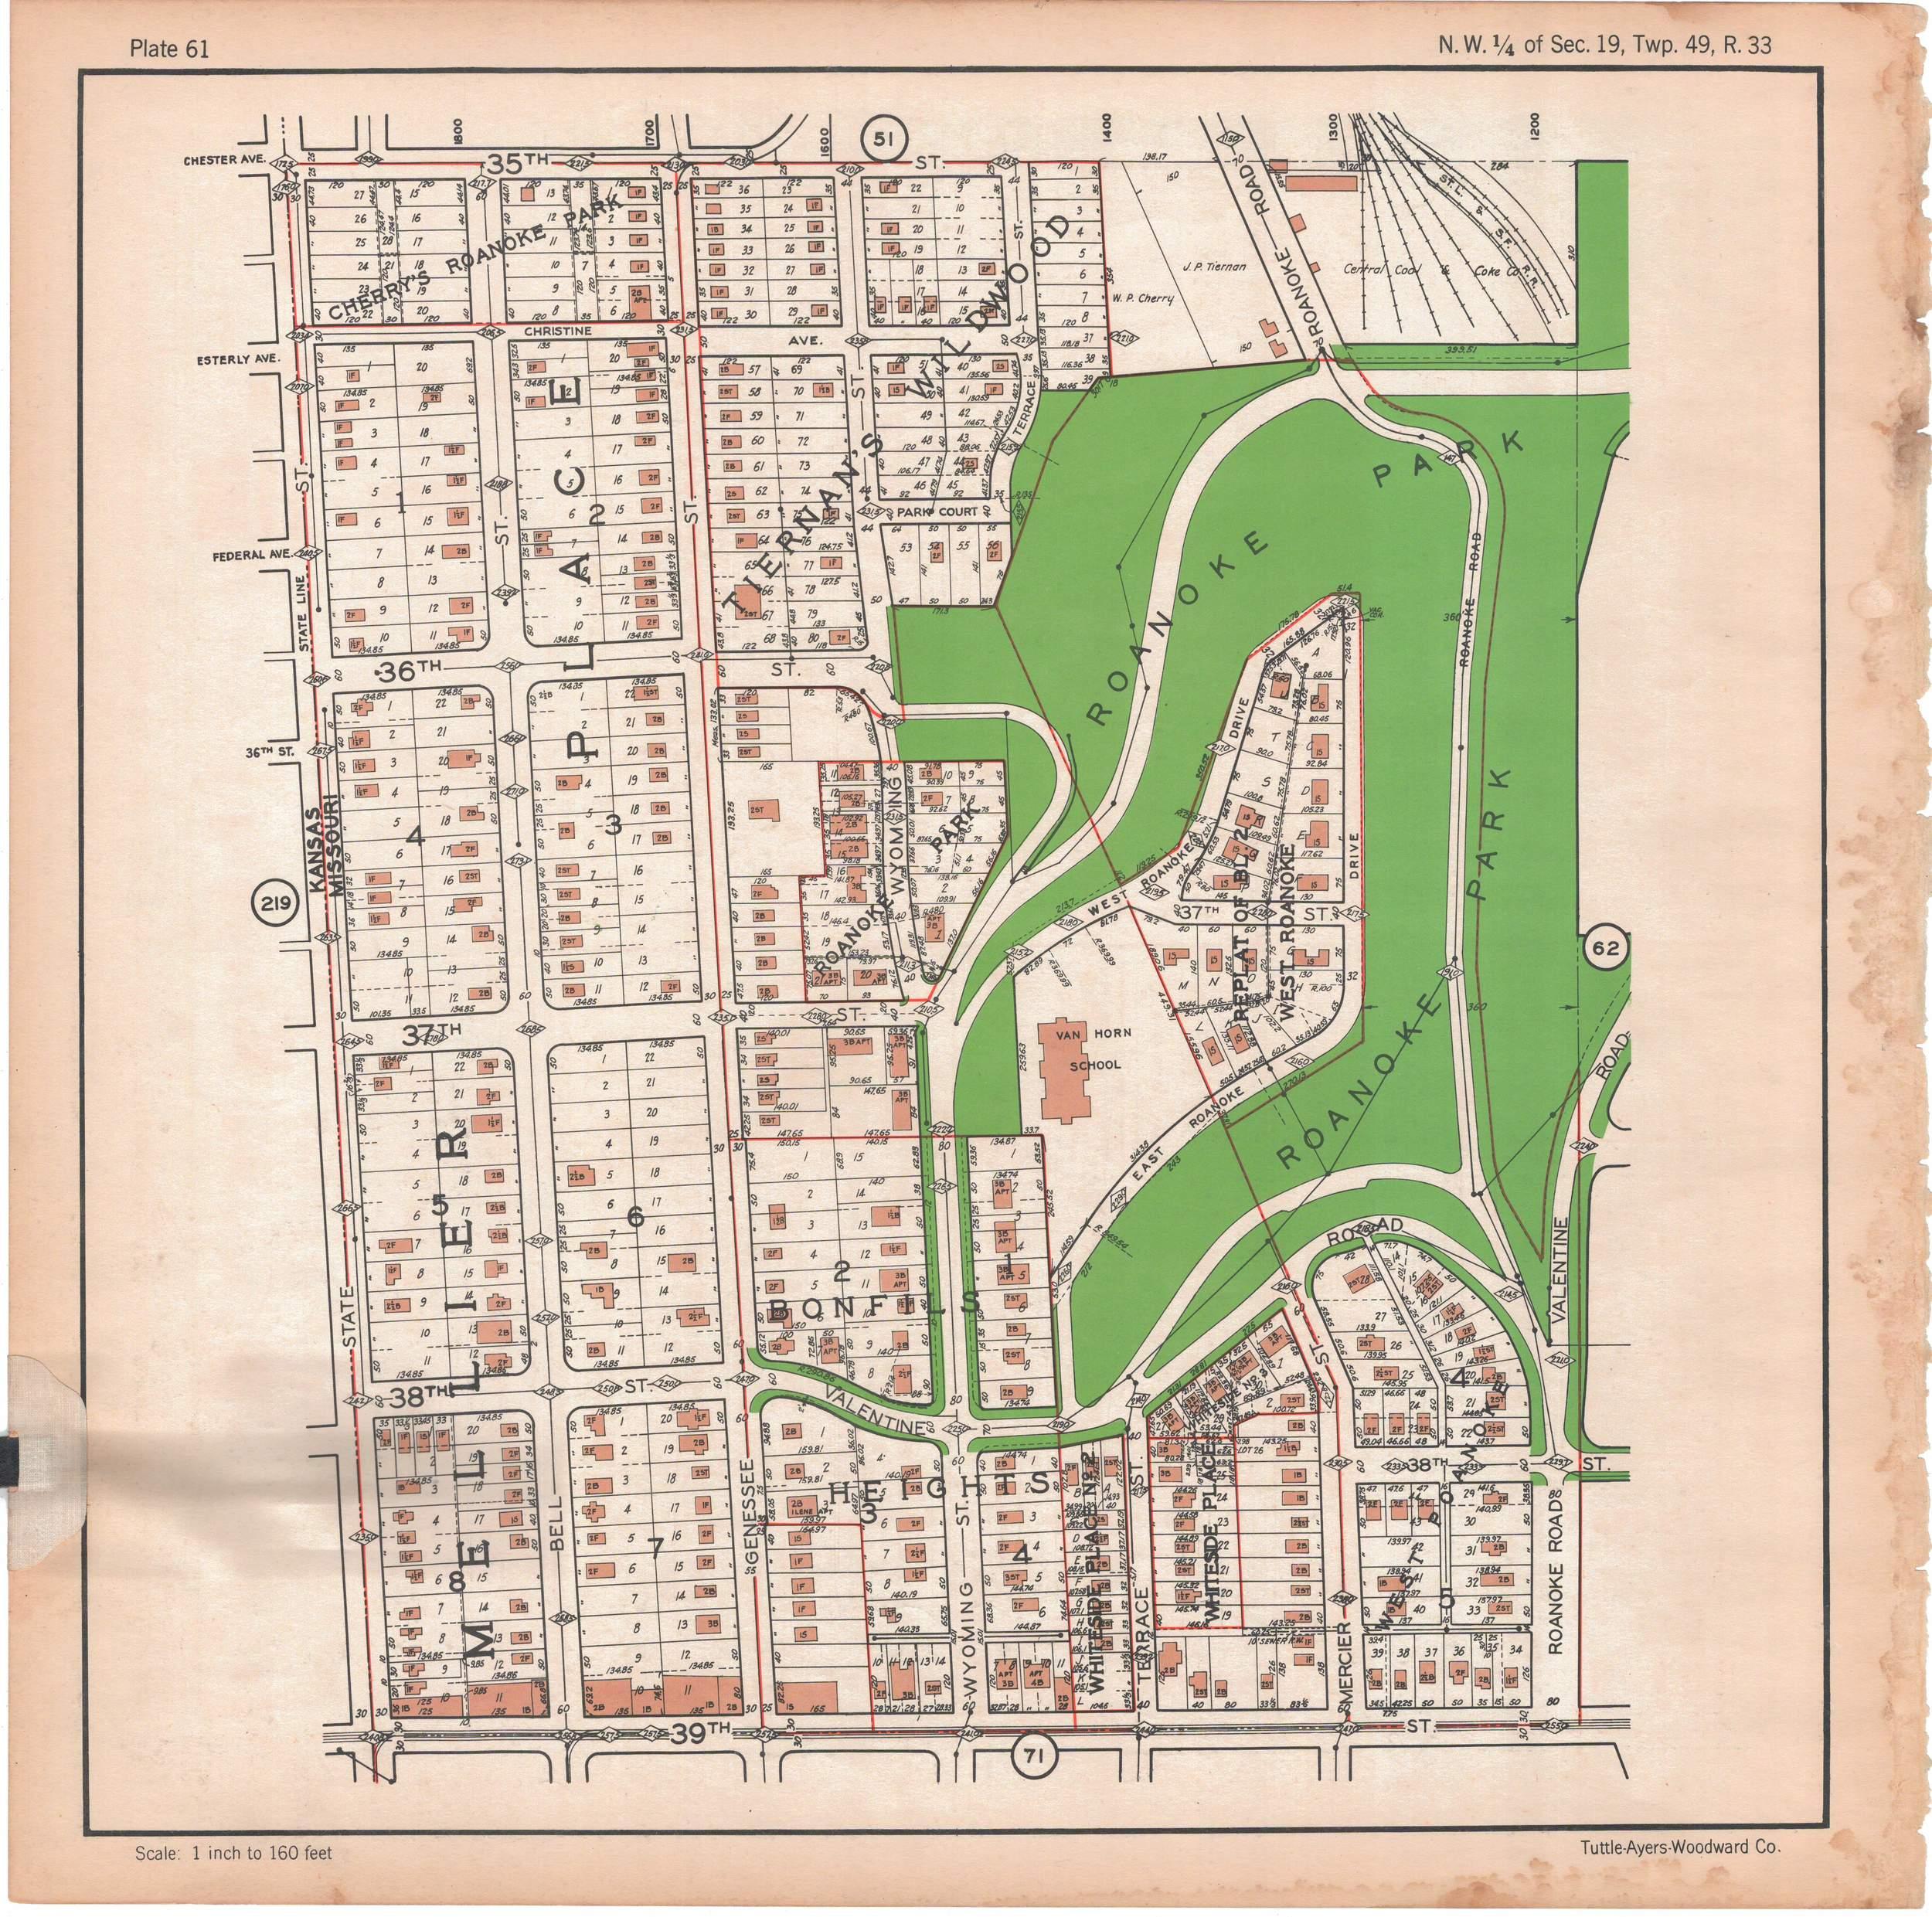 1925 TUTTLE_AYERS_Plate 61.JPG